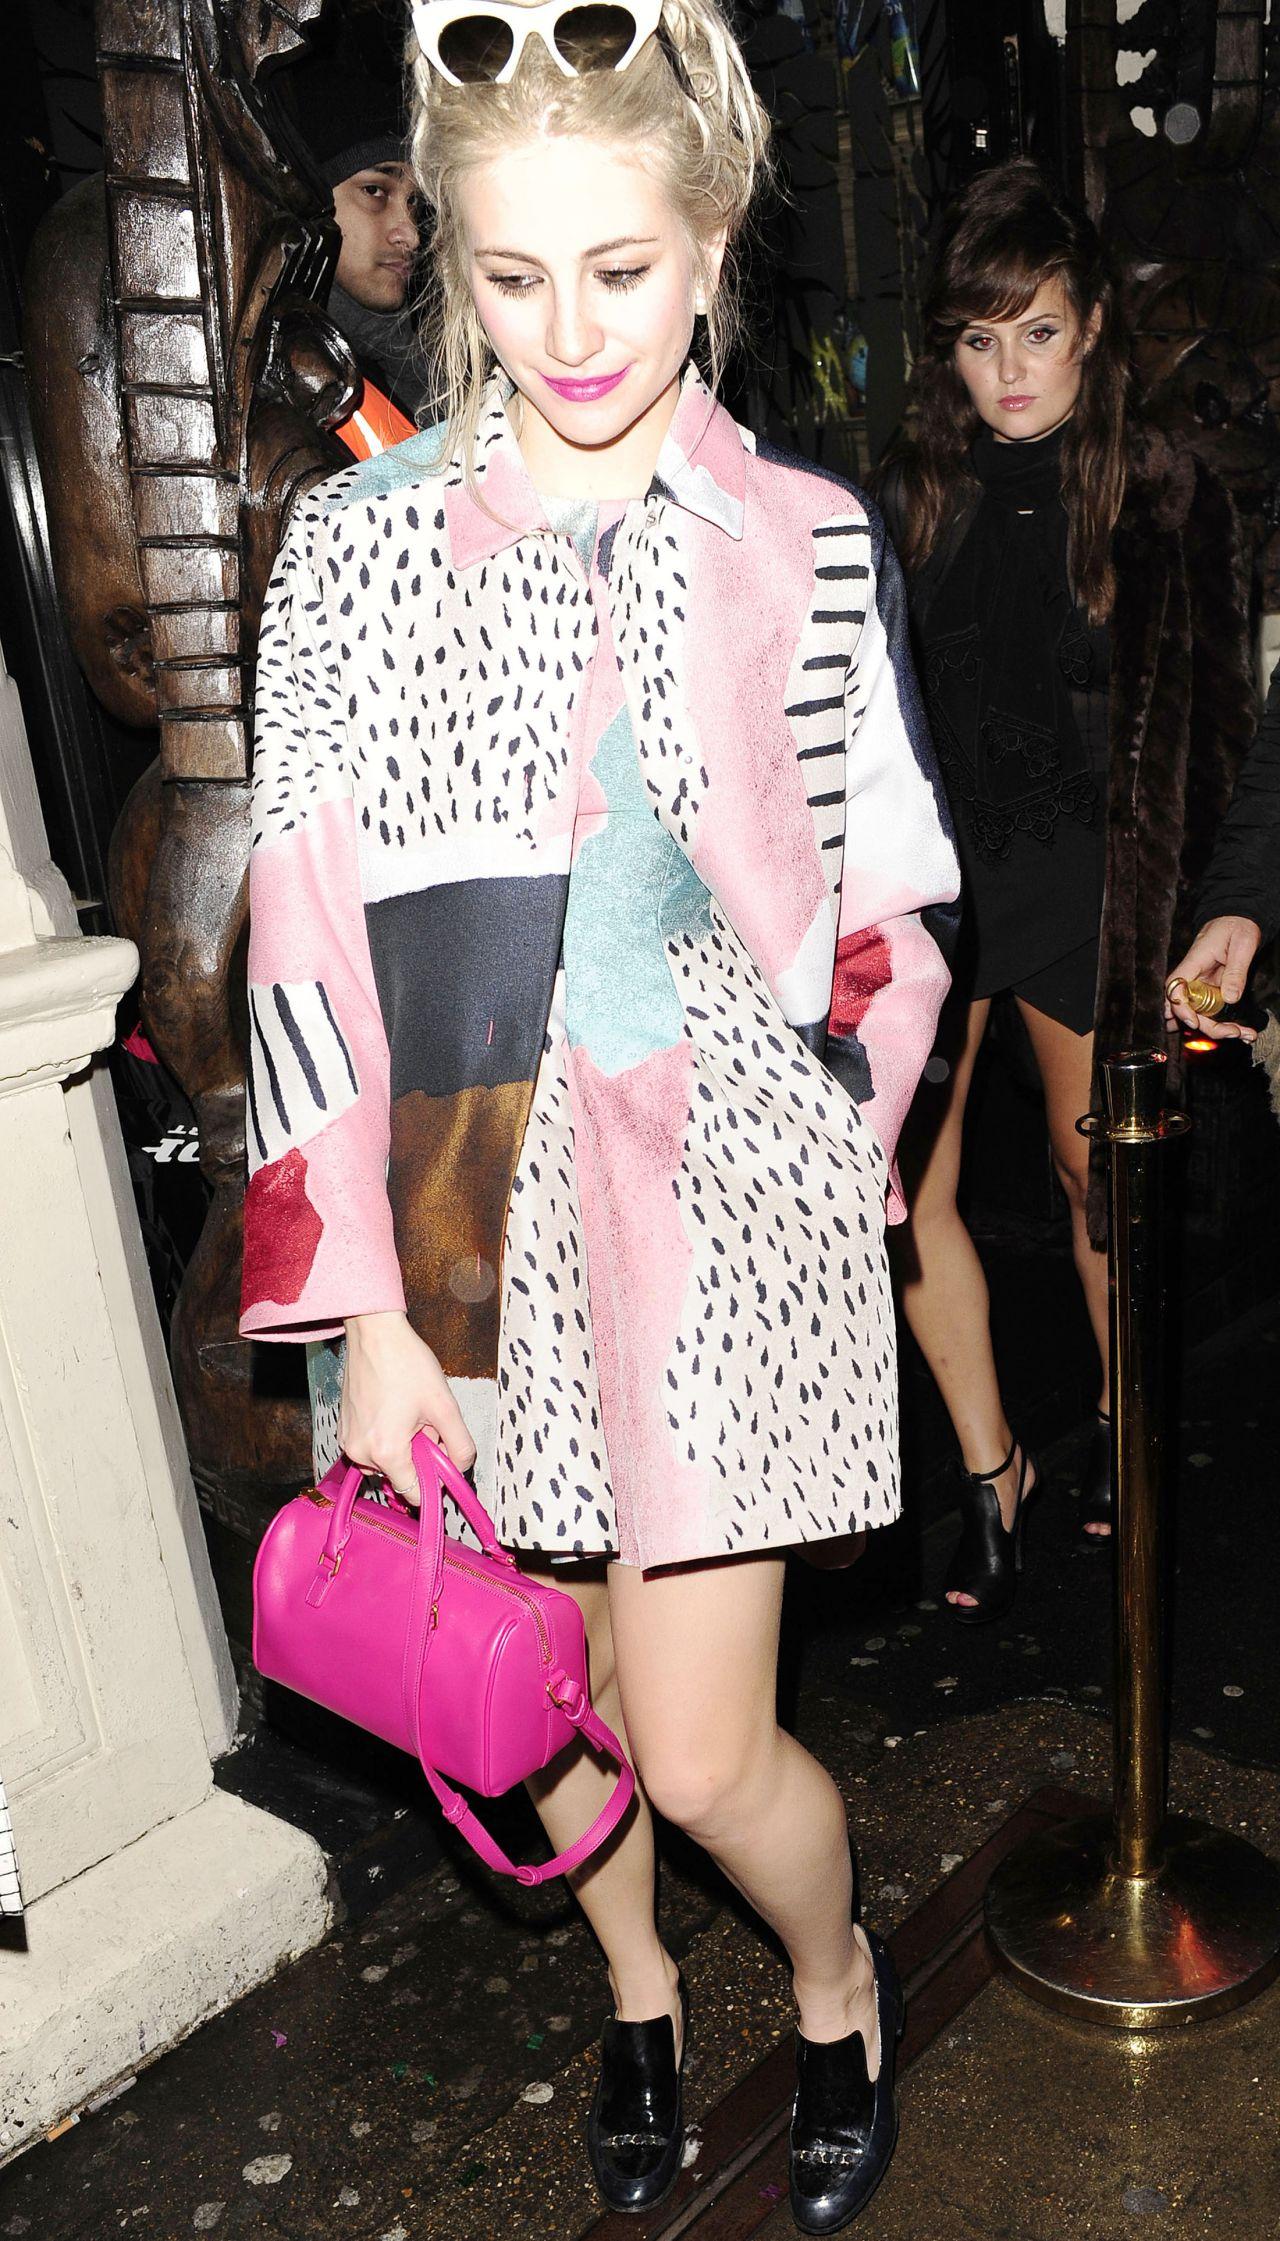 Pixie Lott Night Out Style - Arriving at Mahiki Nightclub in London - Jan. 2015